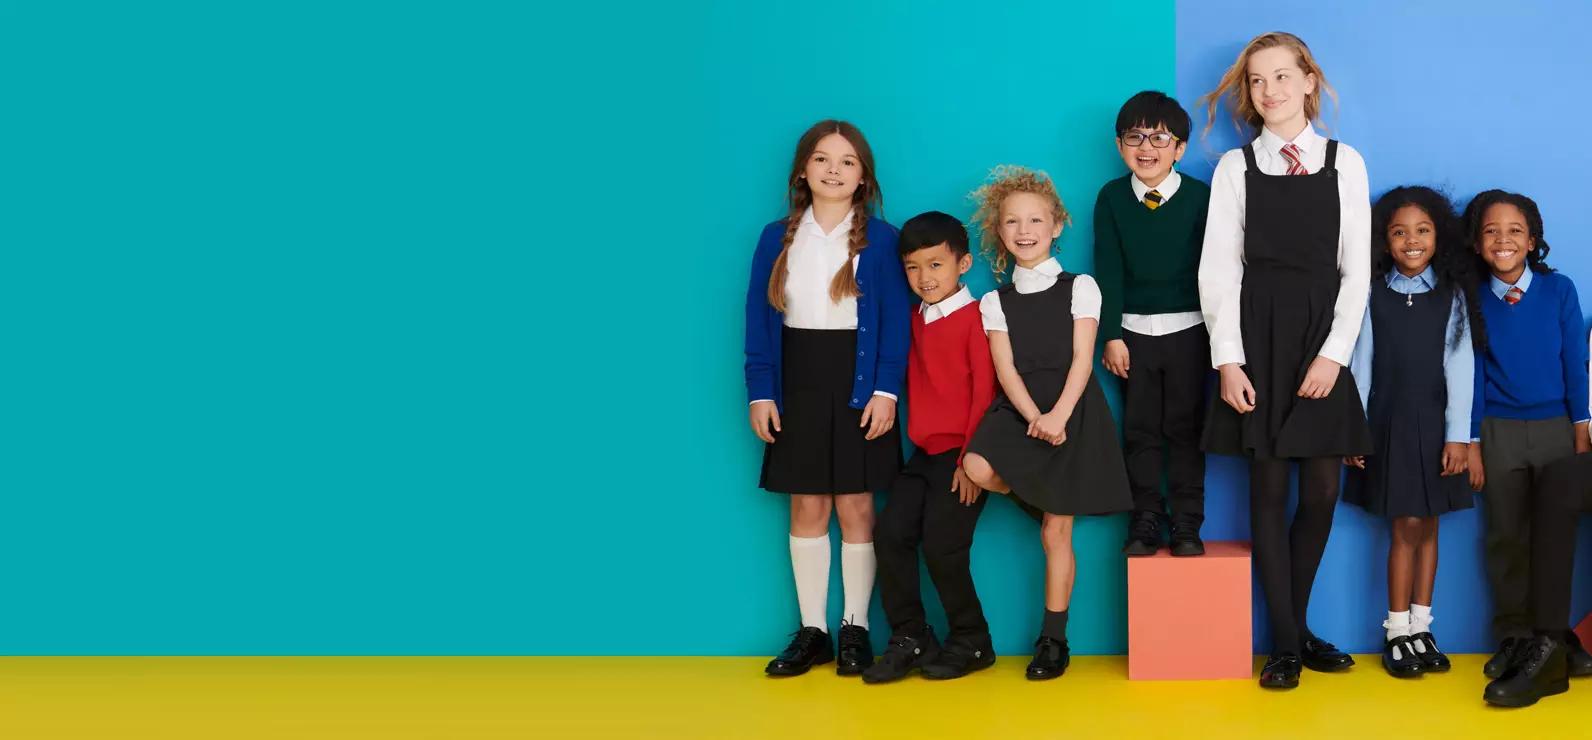 Children's School Uniform for Boys & Girls from £2 (Delivery £3.49) @ Debenhams